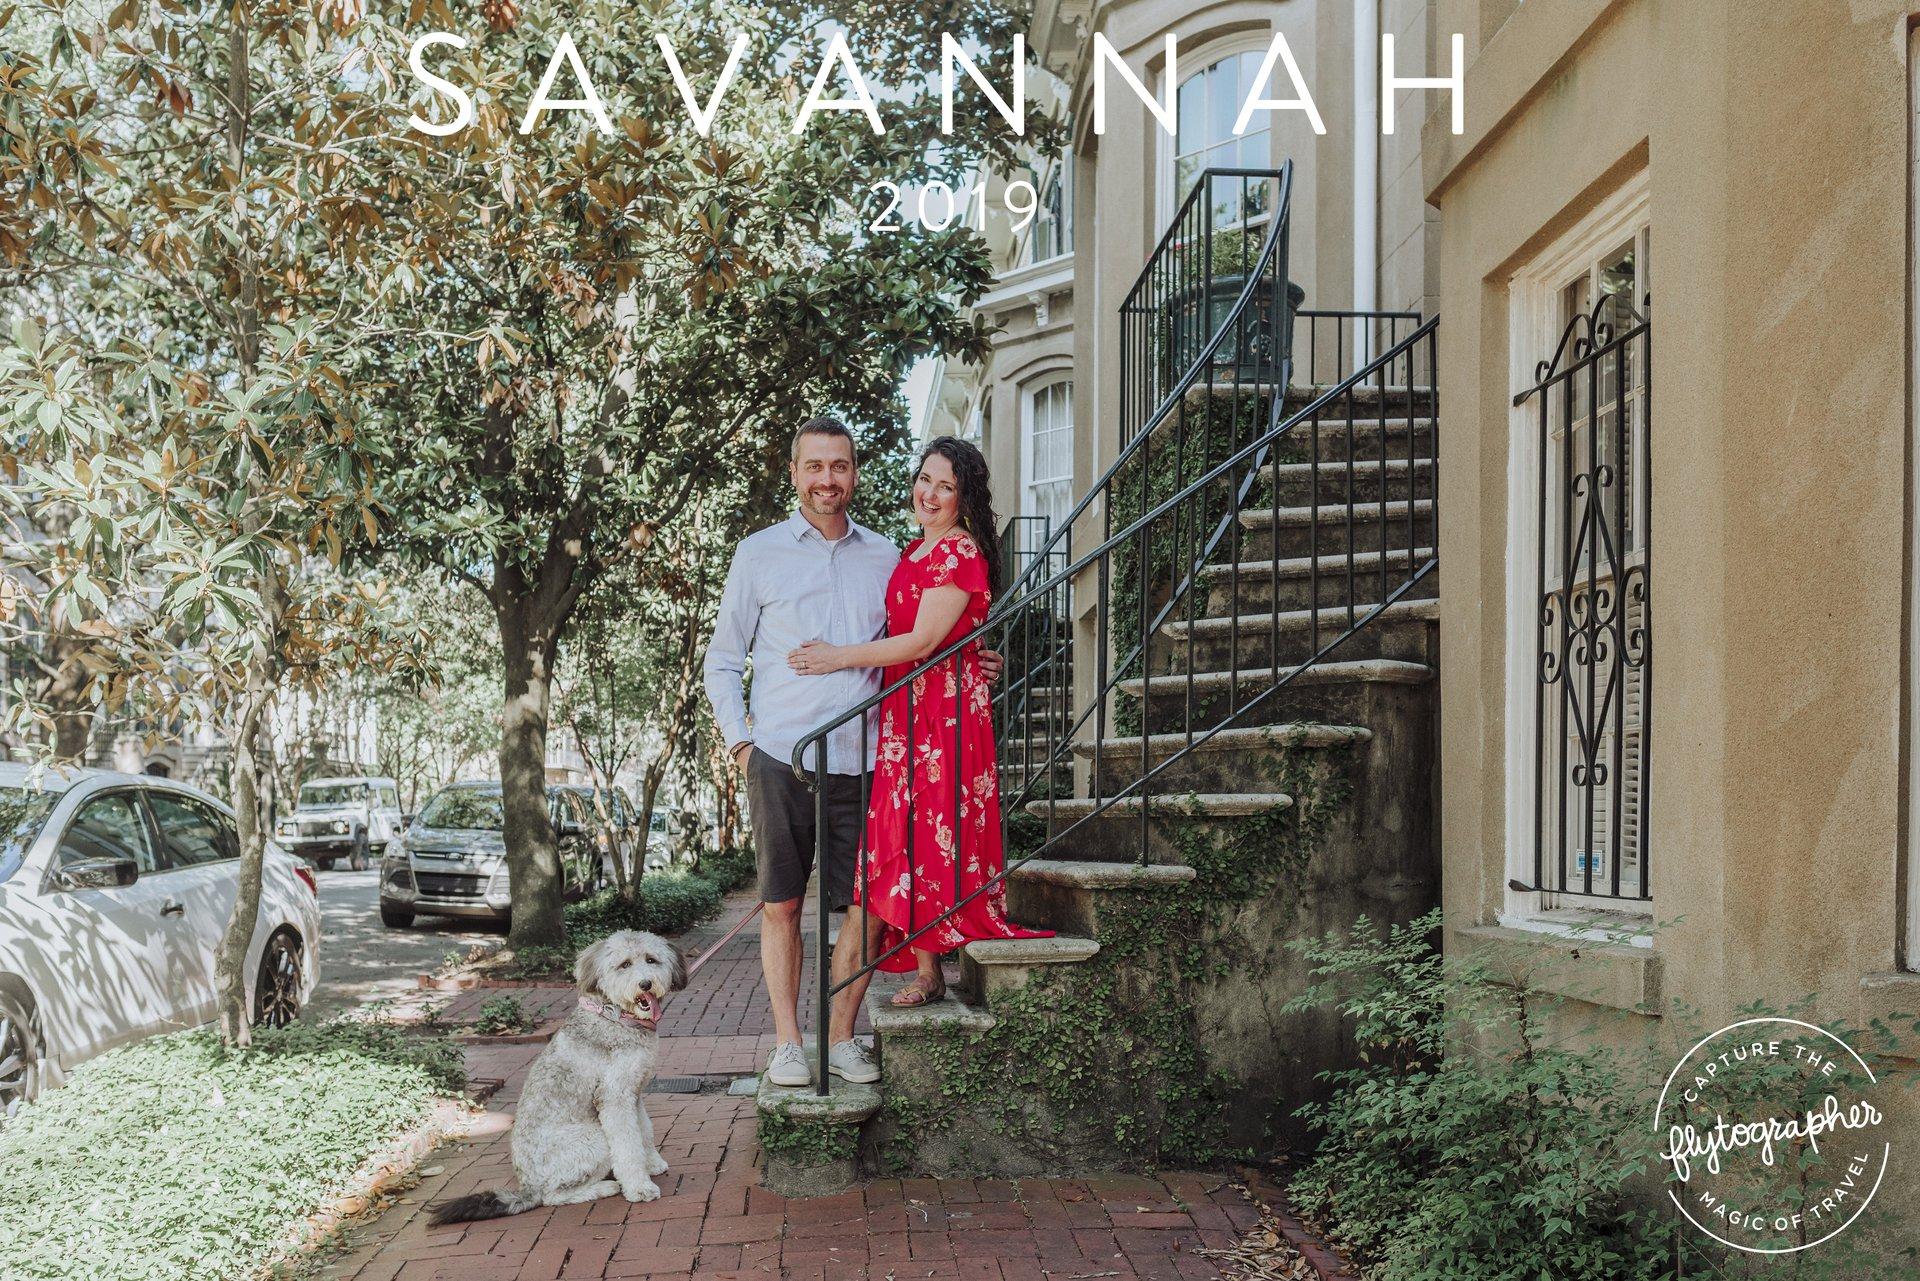 Savannah-United States-travel-story-Flytographer-40